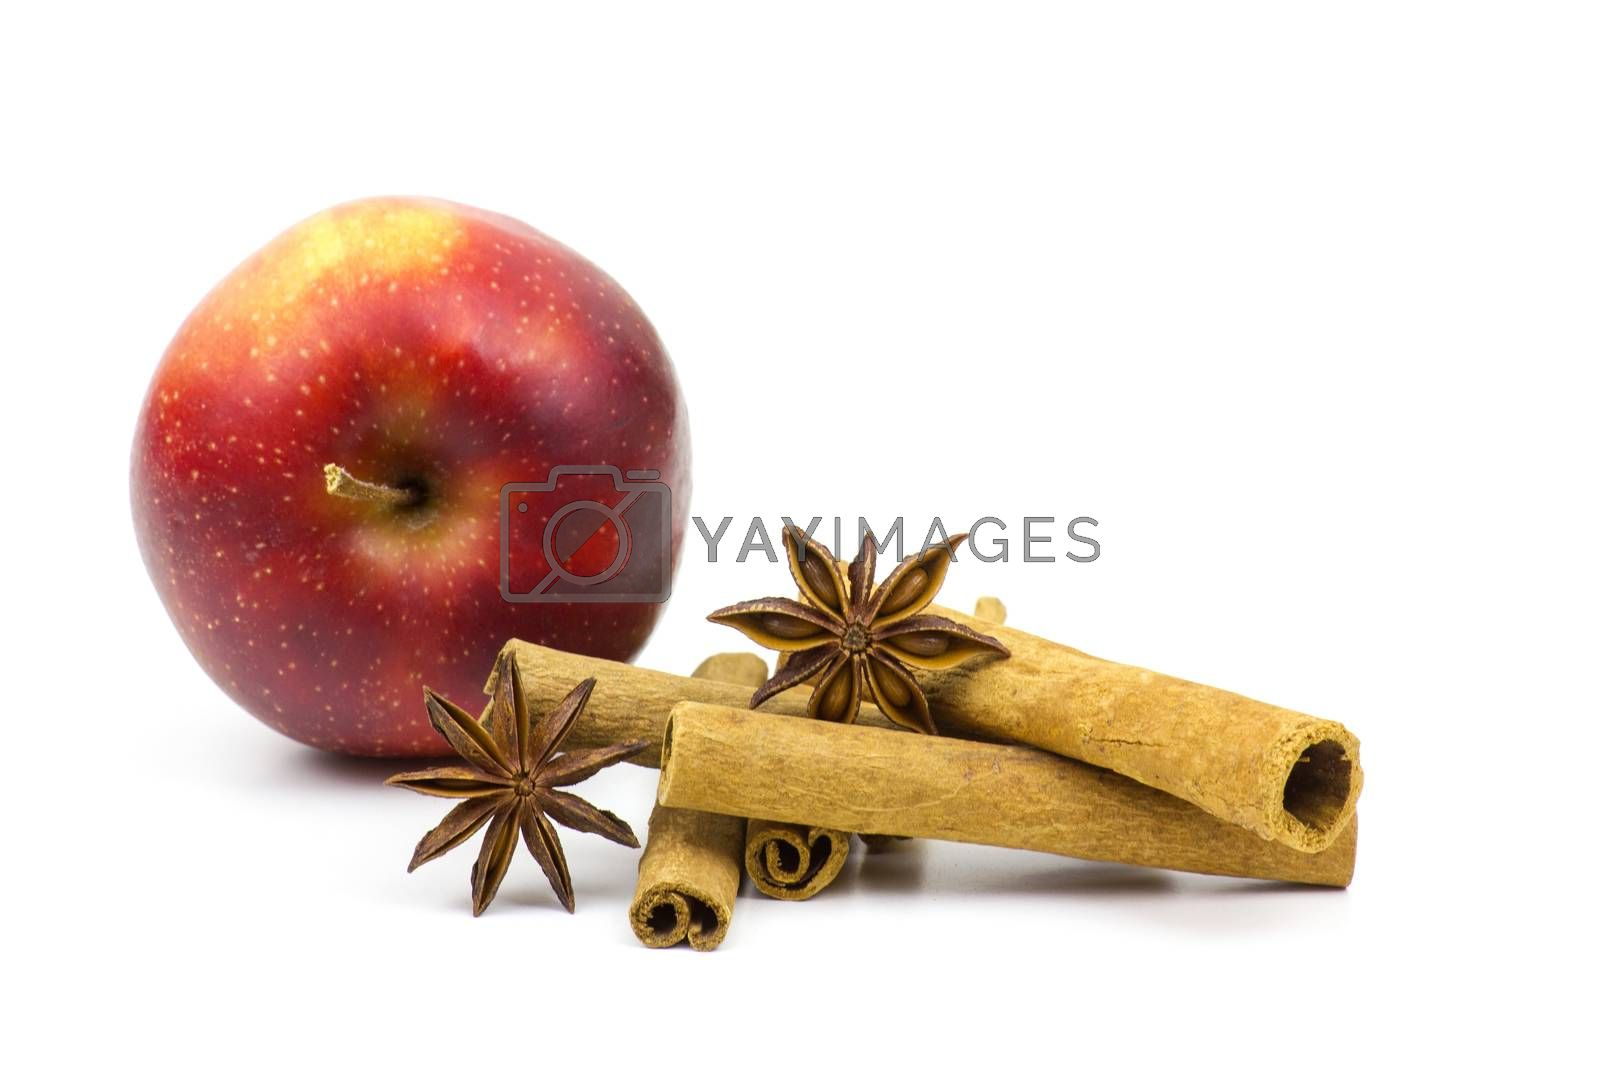 apple, cinnamon sticks and anise